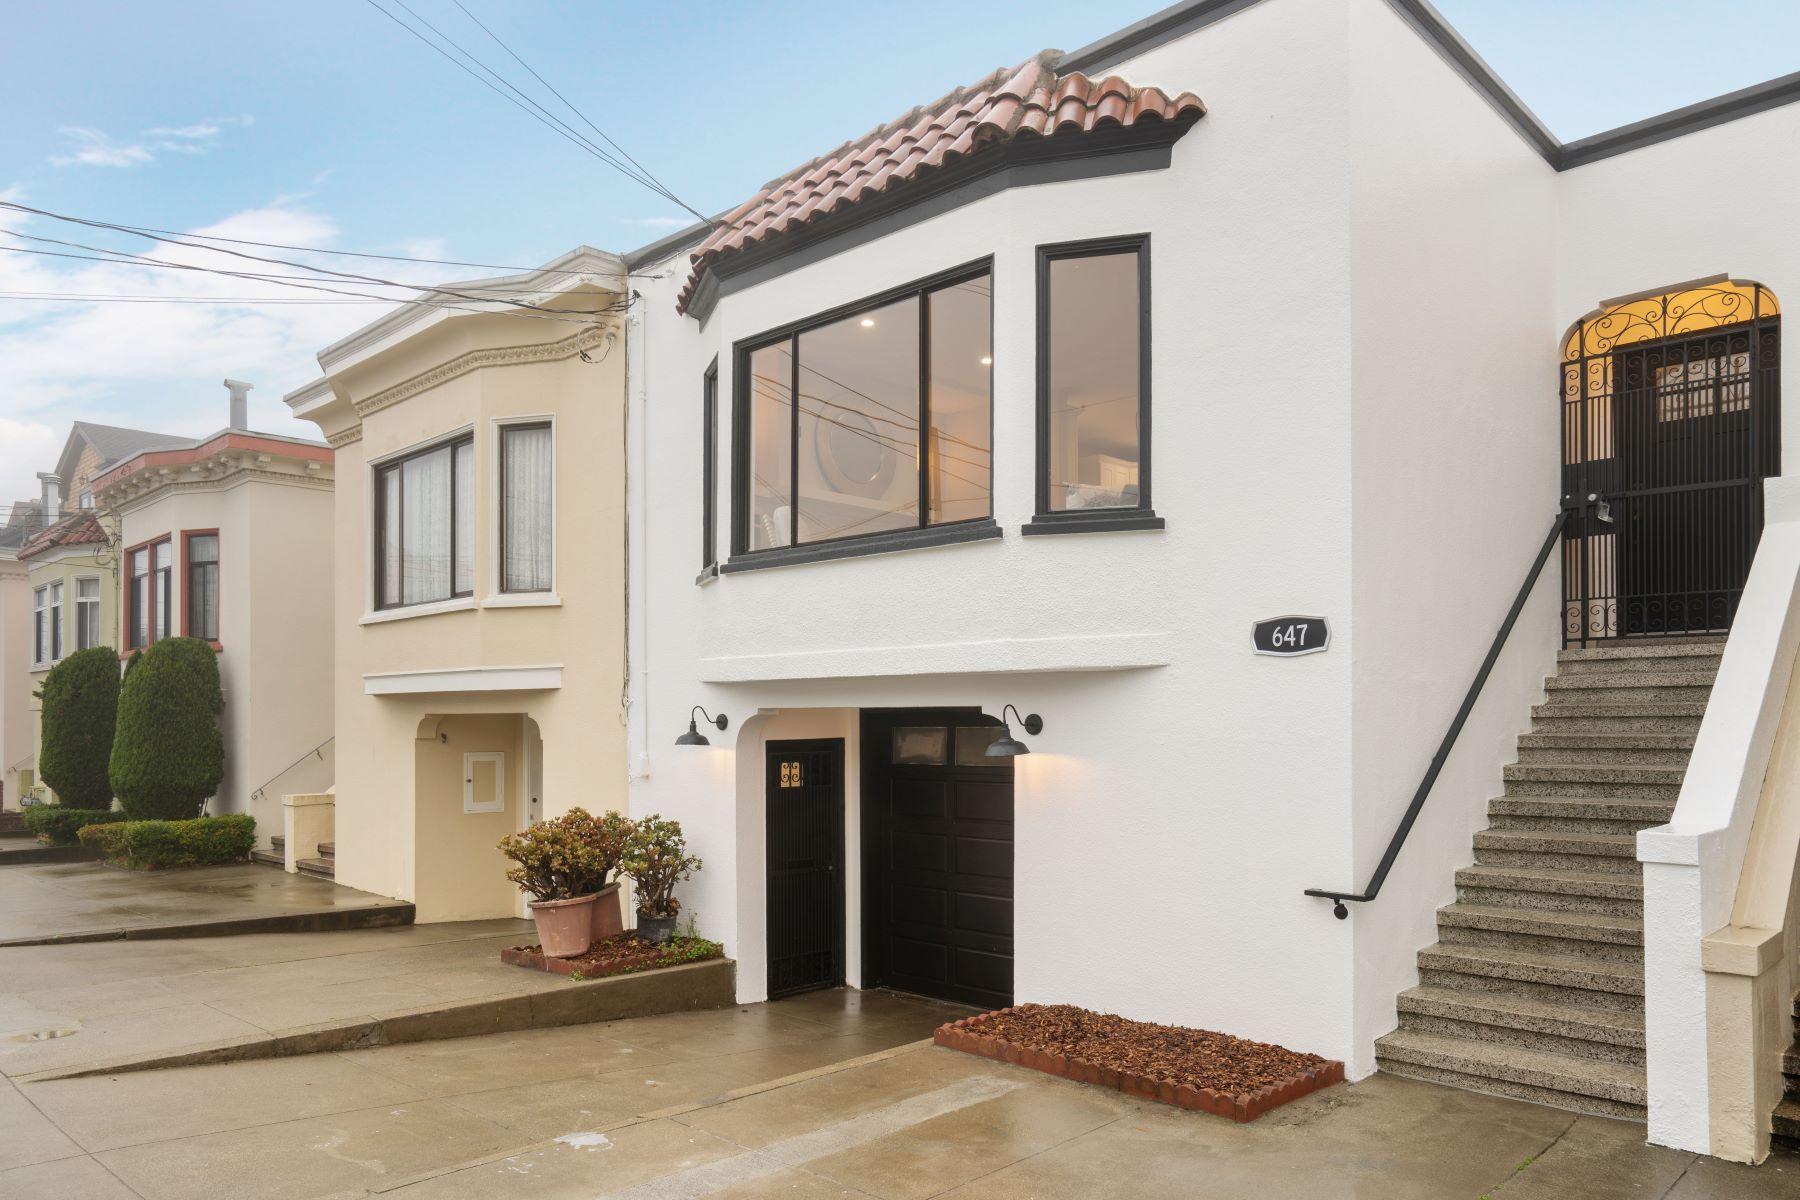 Single Family Homes for Active at Striking Marina-Style San Francisco Home 647 34th Avenue San Francisco, California 94121 United States